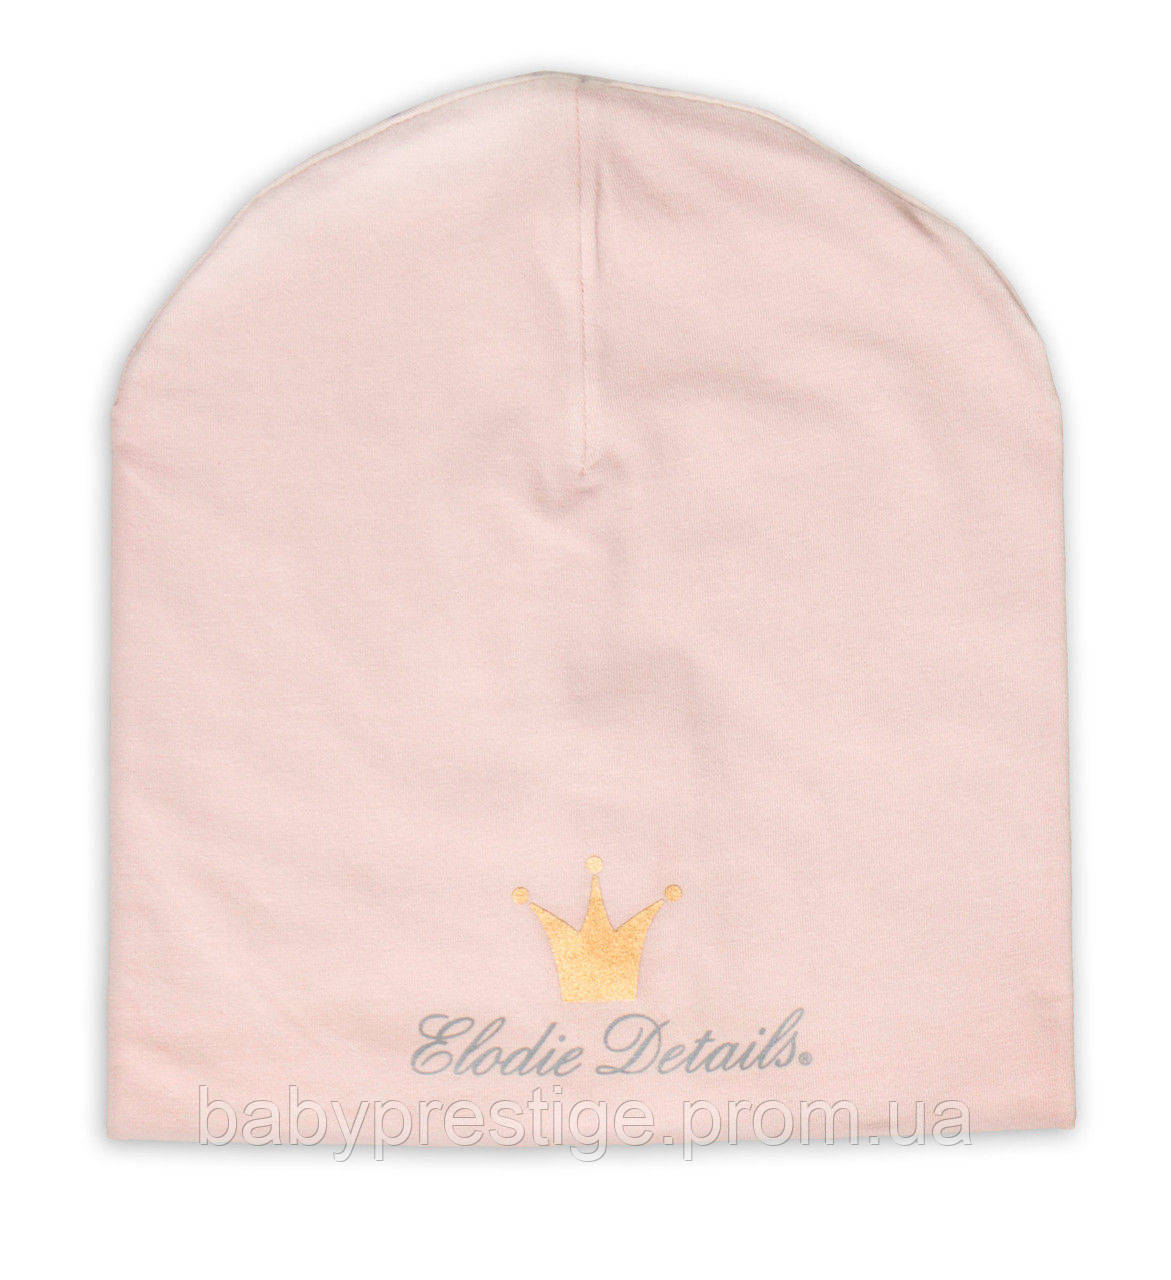 Elodie details шапка - бини Powder Pink, 2-3 года